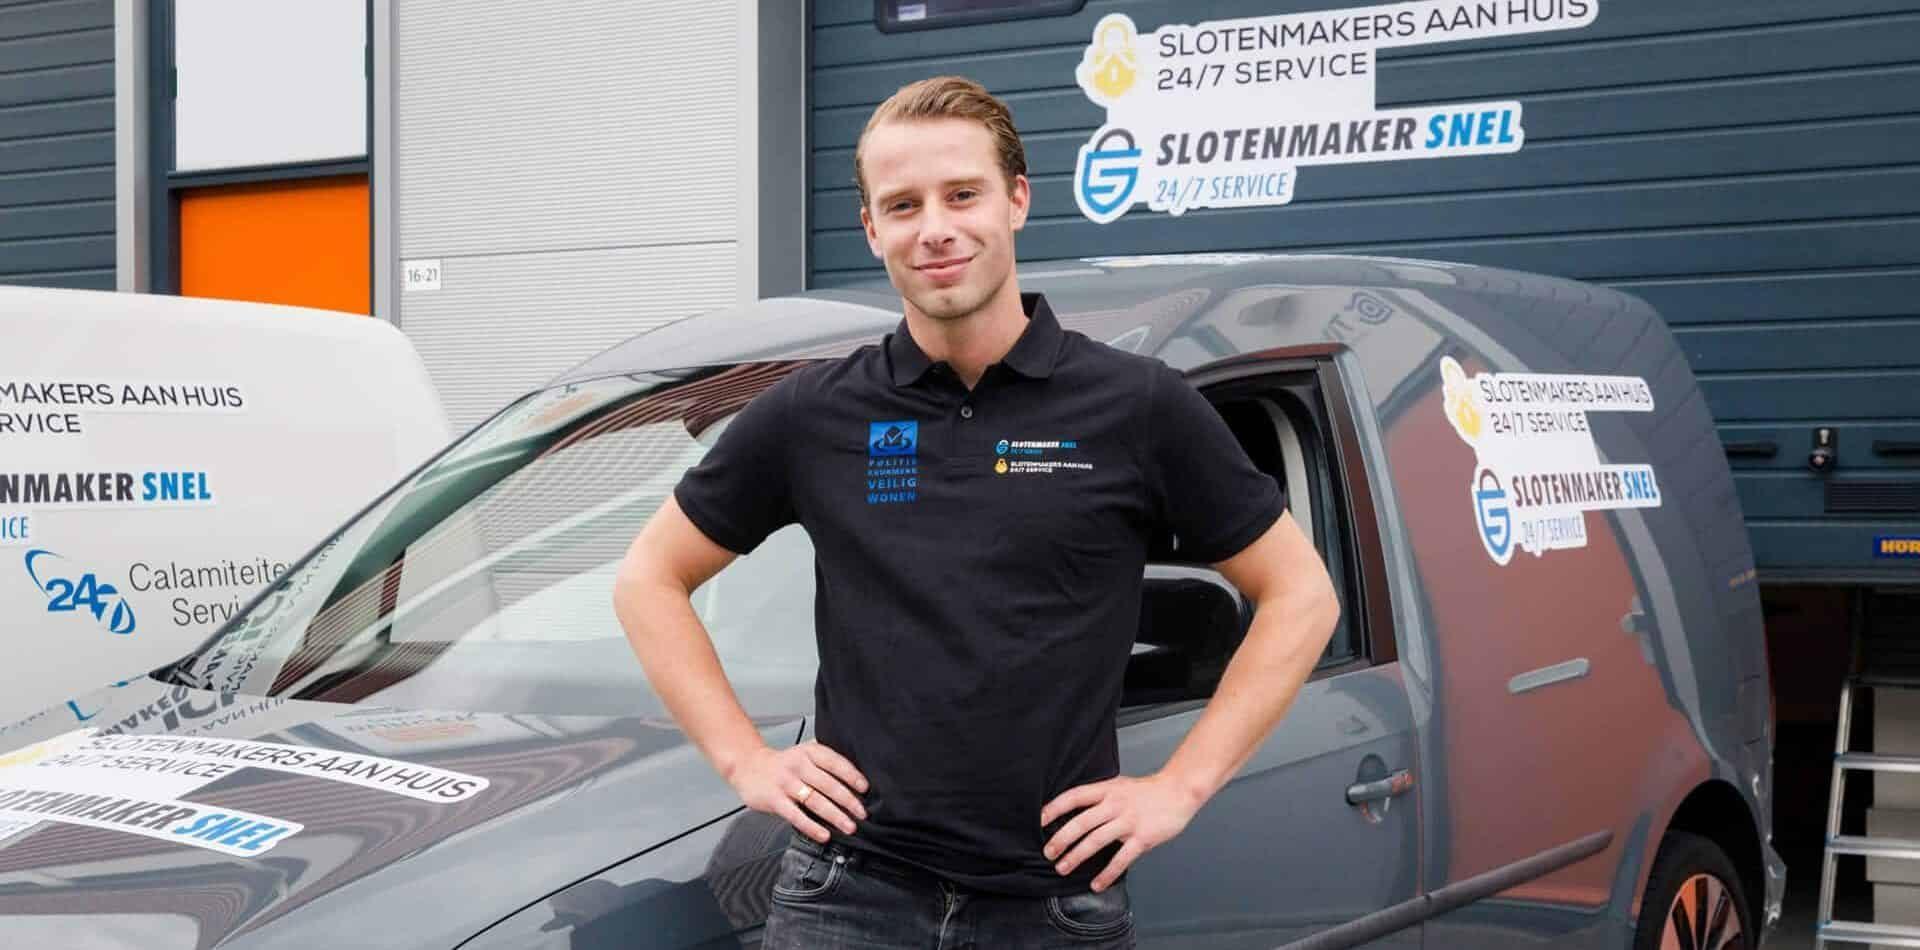 Slotenmaker Raalte(7)